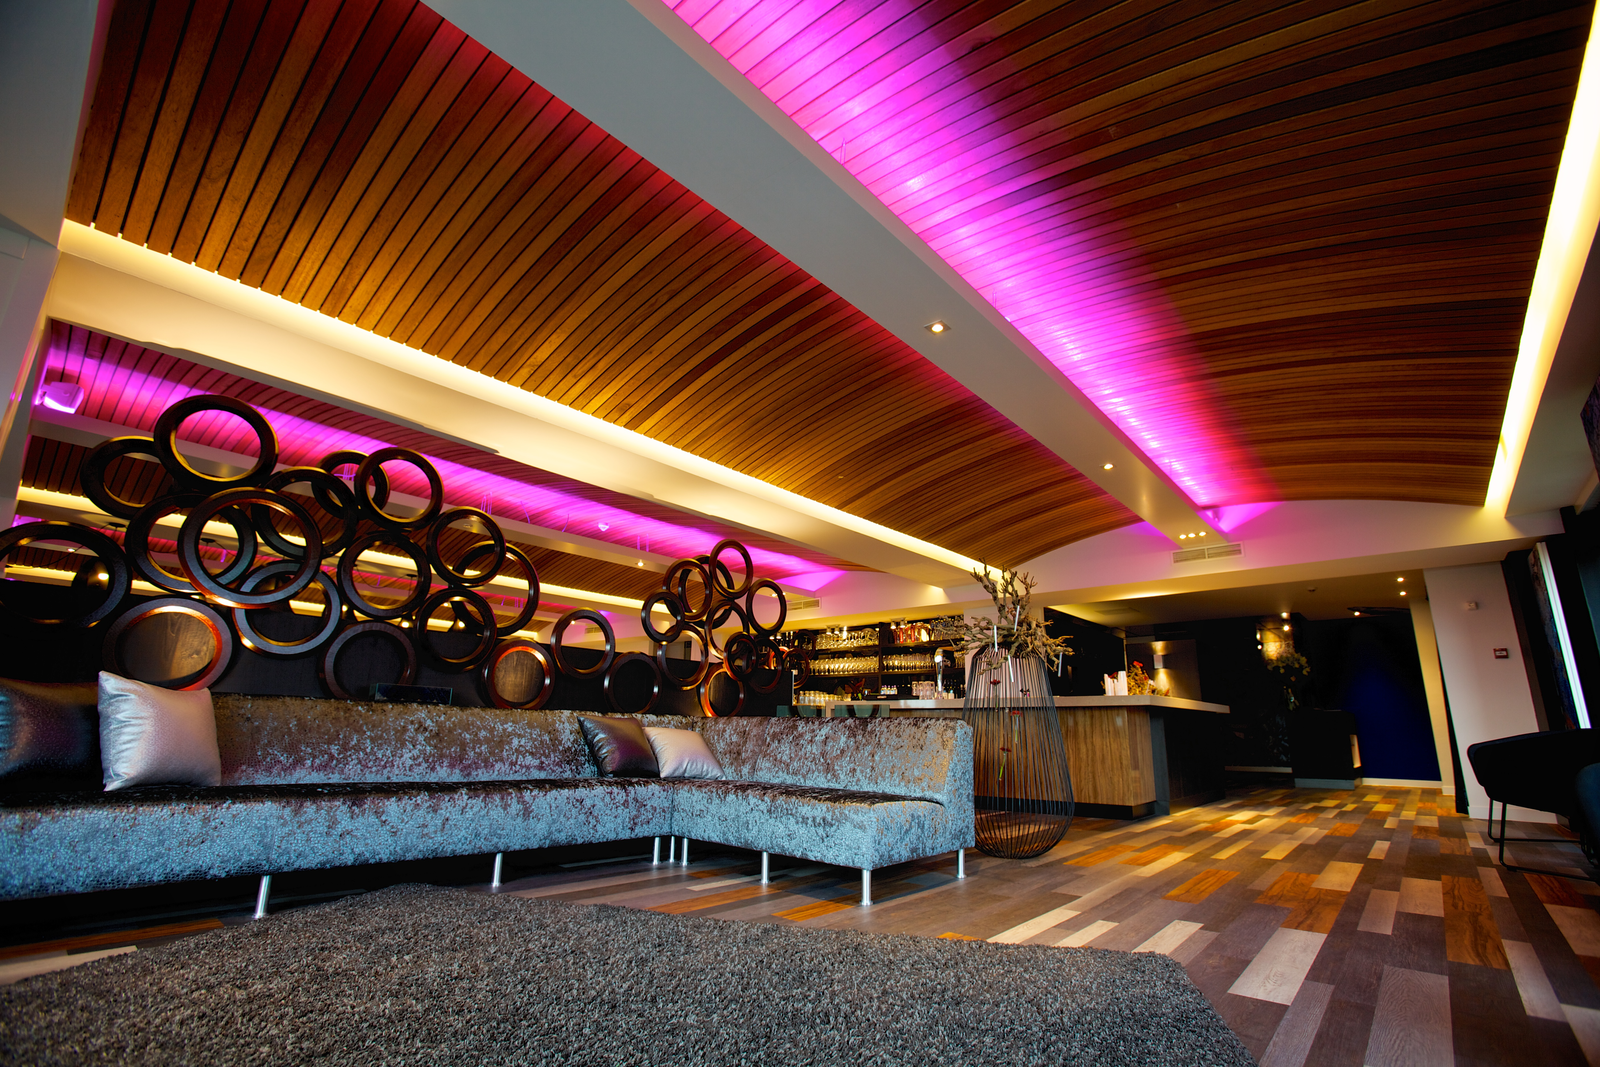 Hampshire Newport Huizen : Book hampshire hotel newport huizen amsterdam teletext holidays